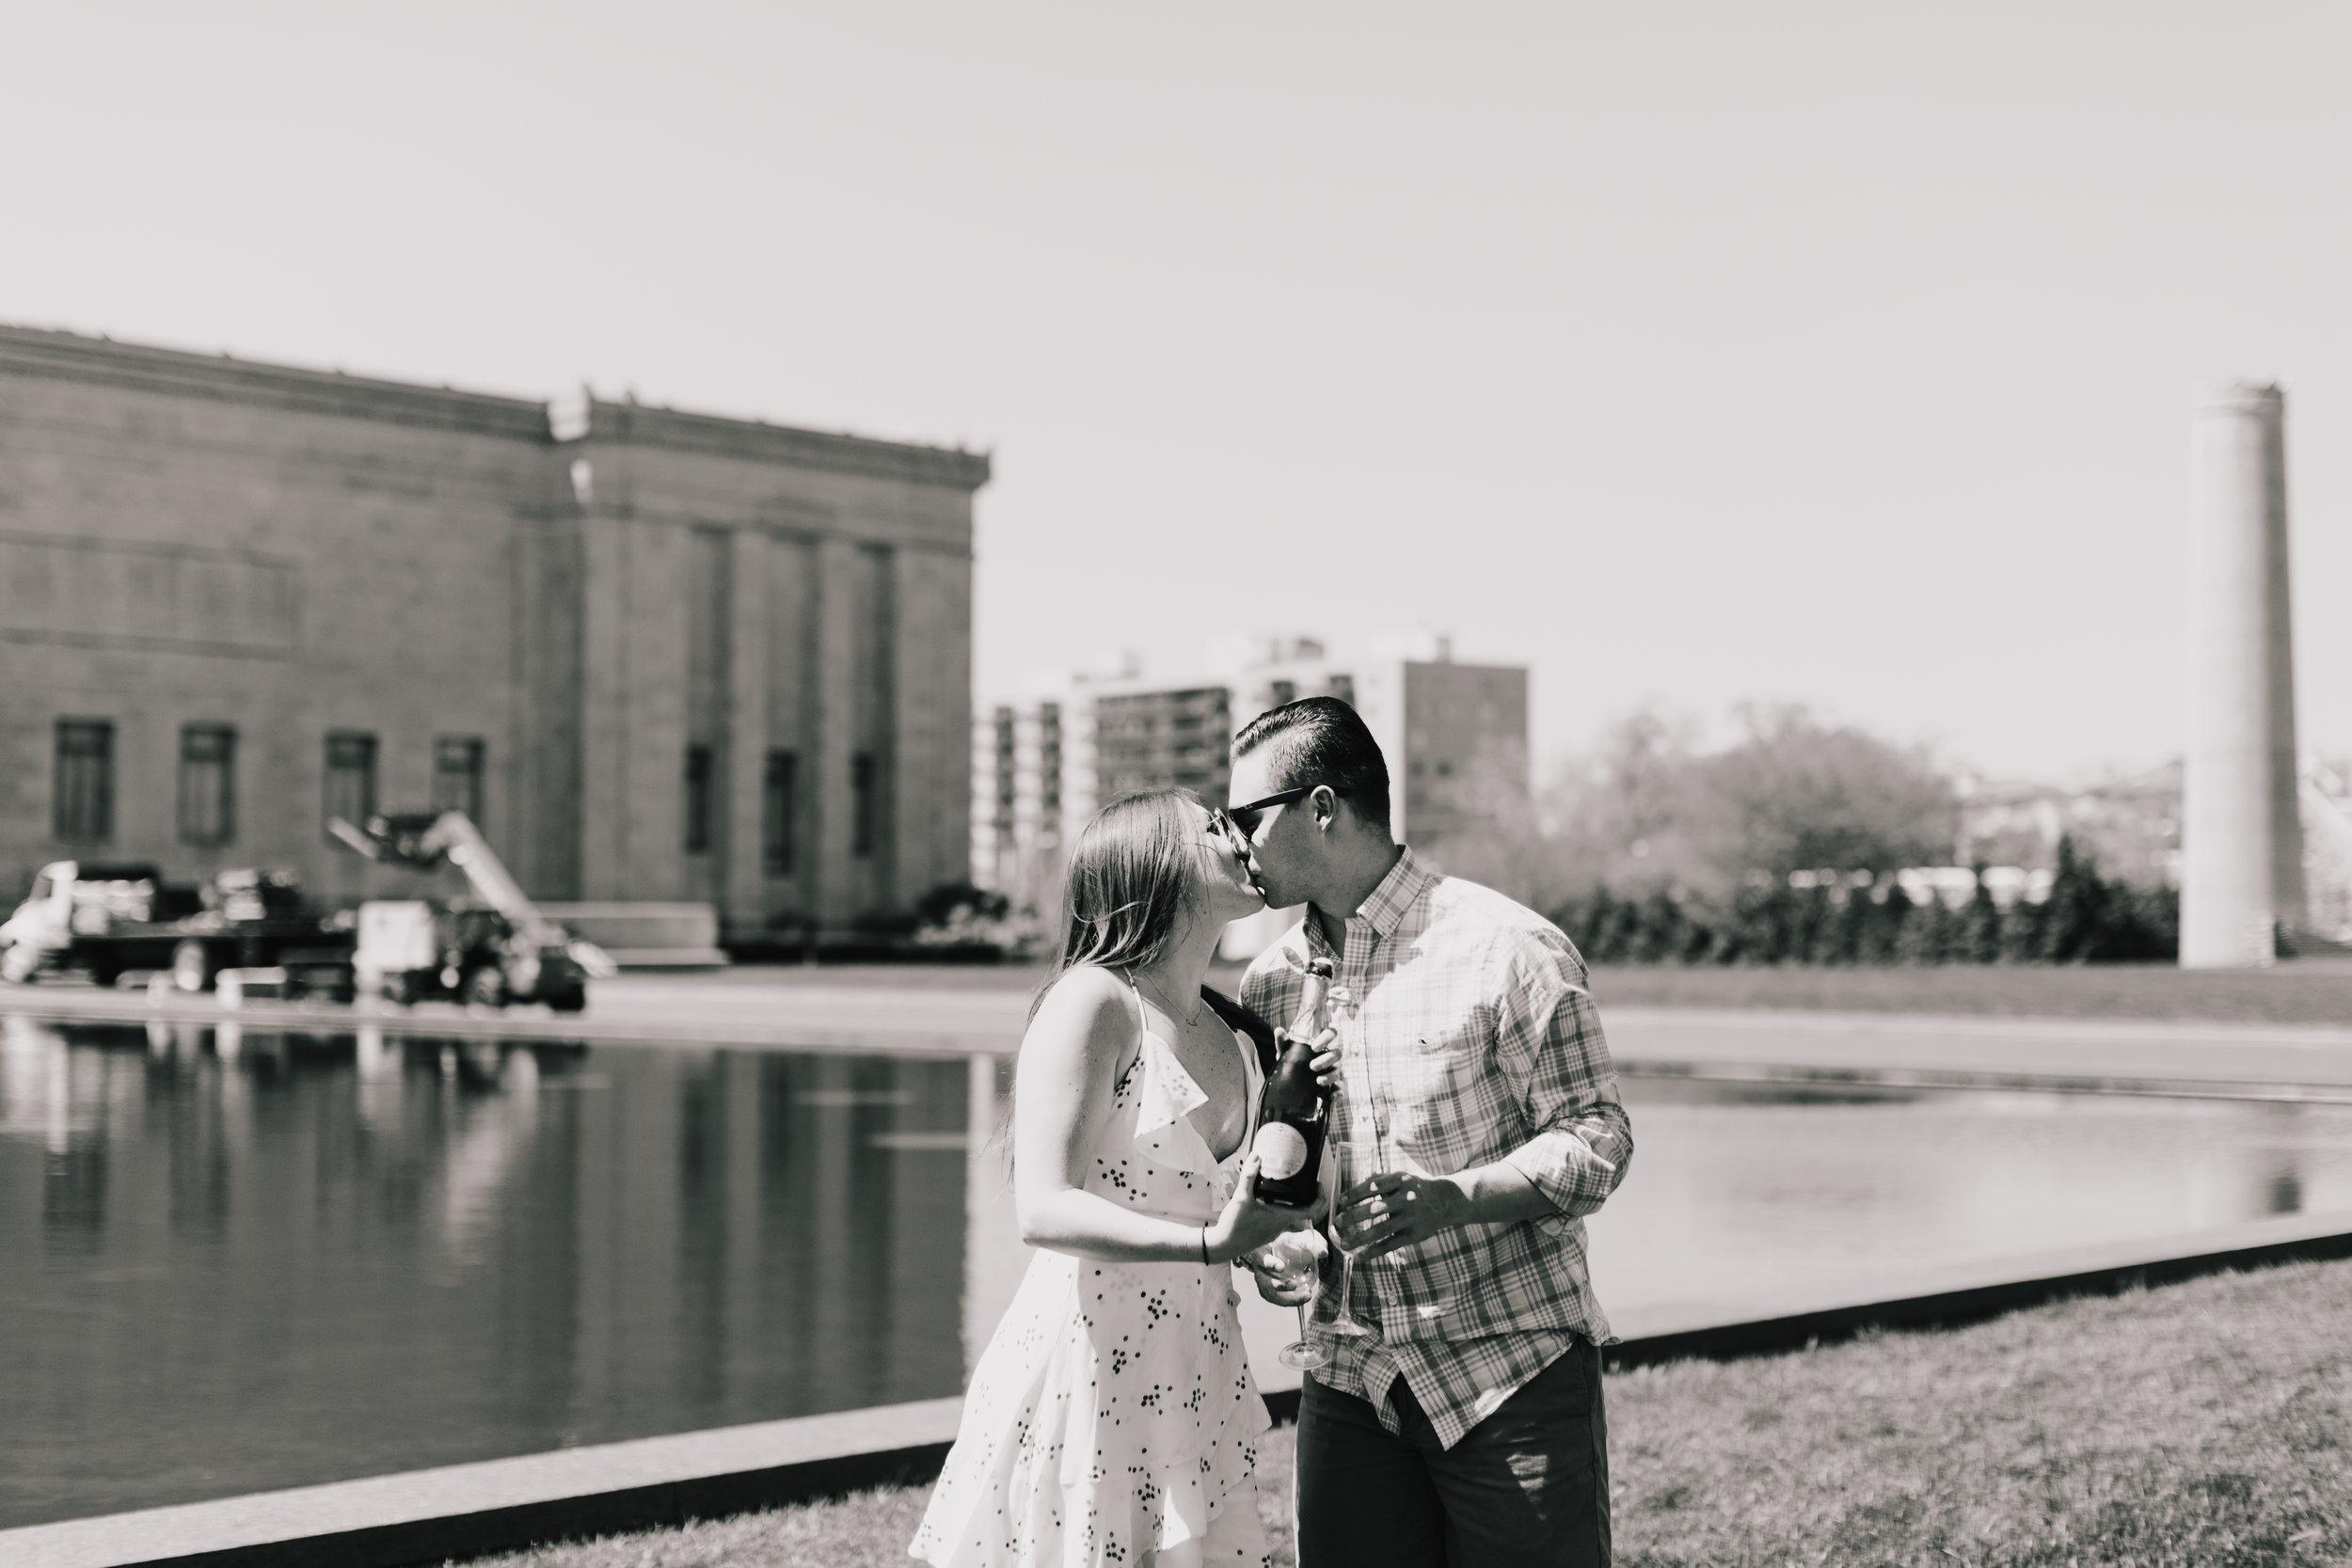 alyssa barletter photography proposal nelson atkins museum kansas city missouri how he asked-14.jpg